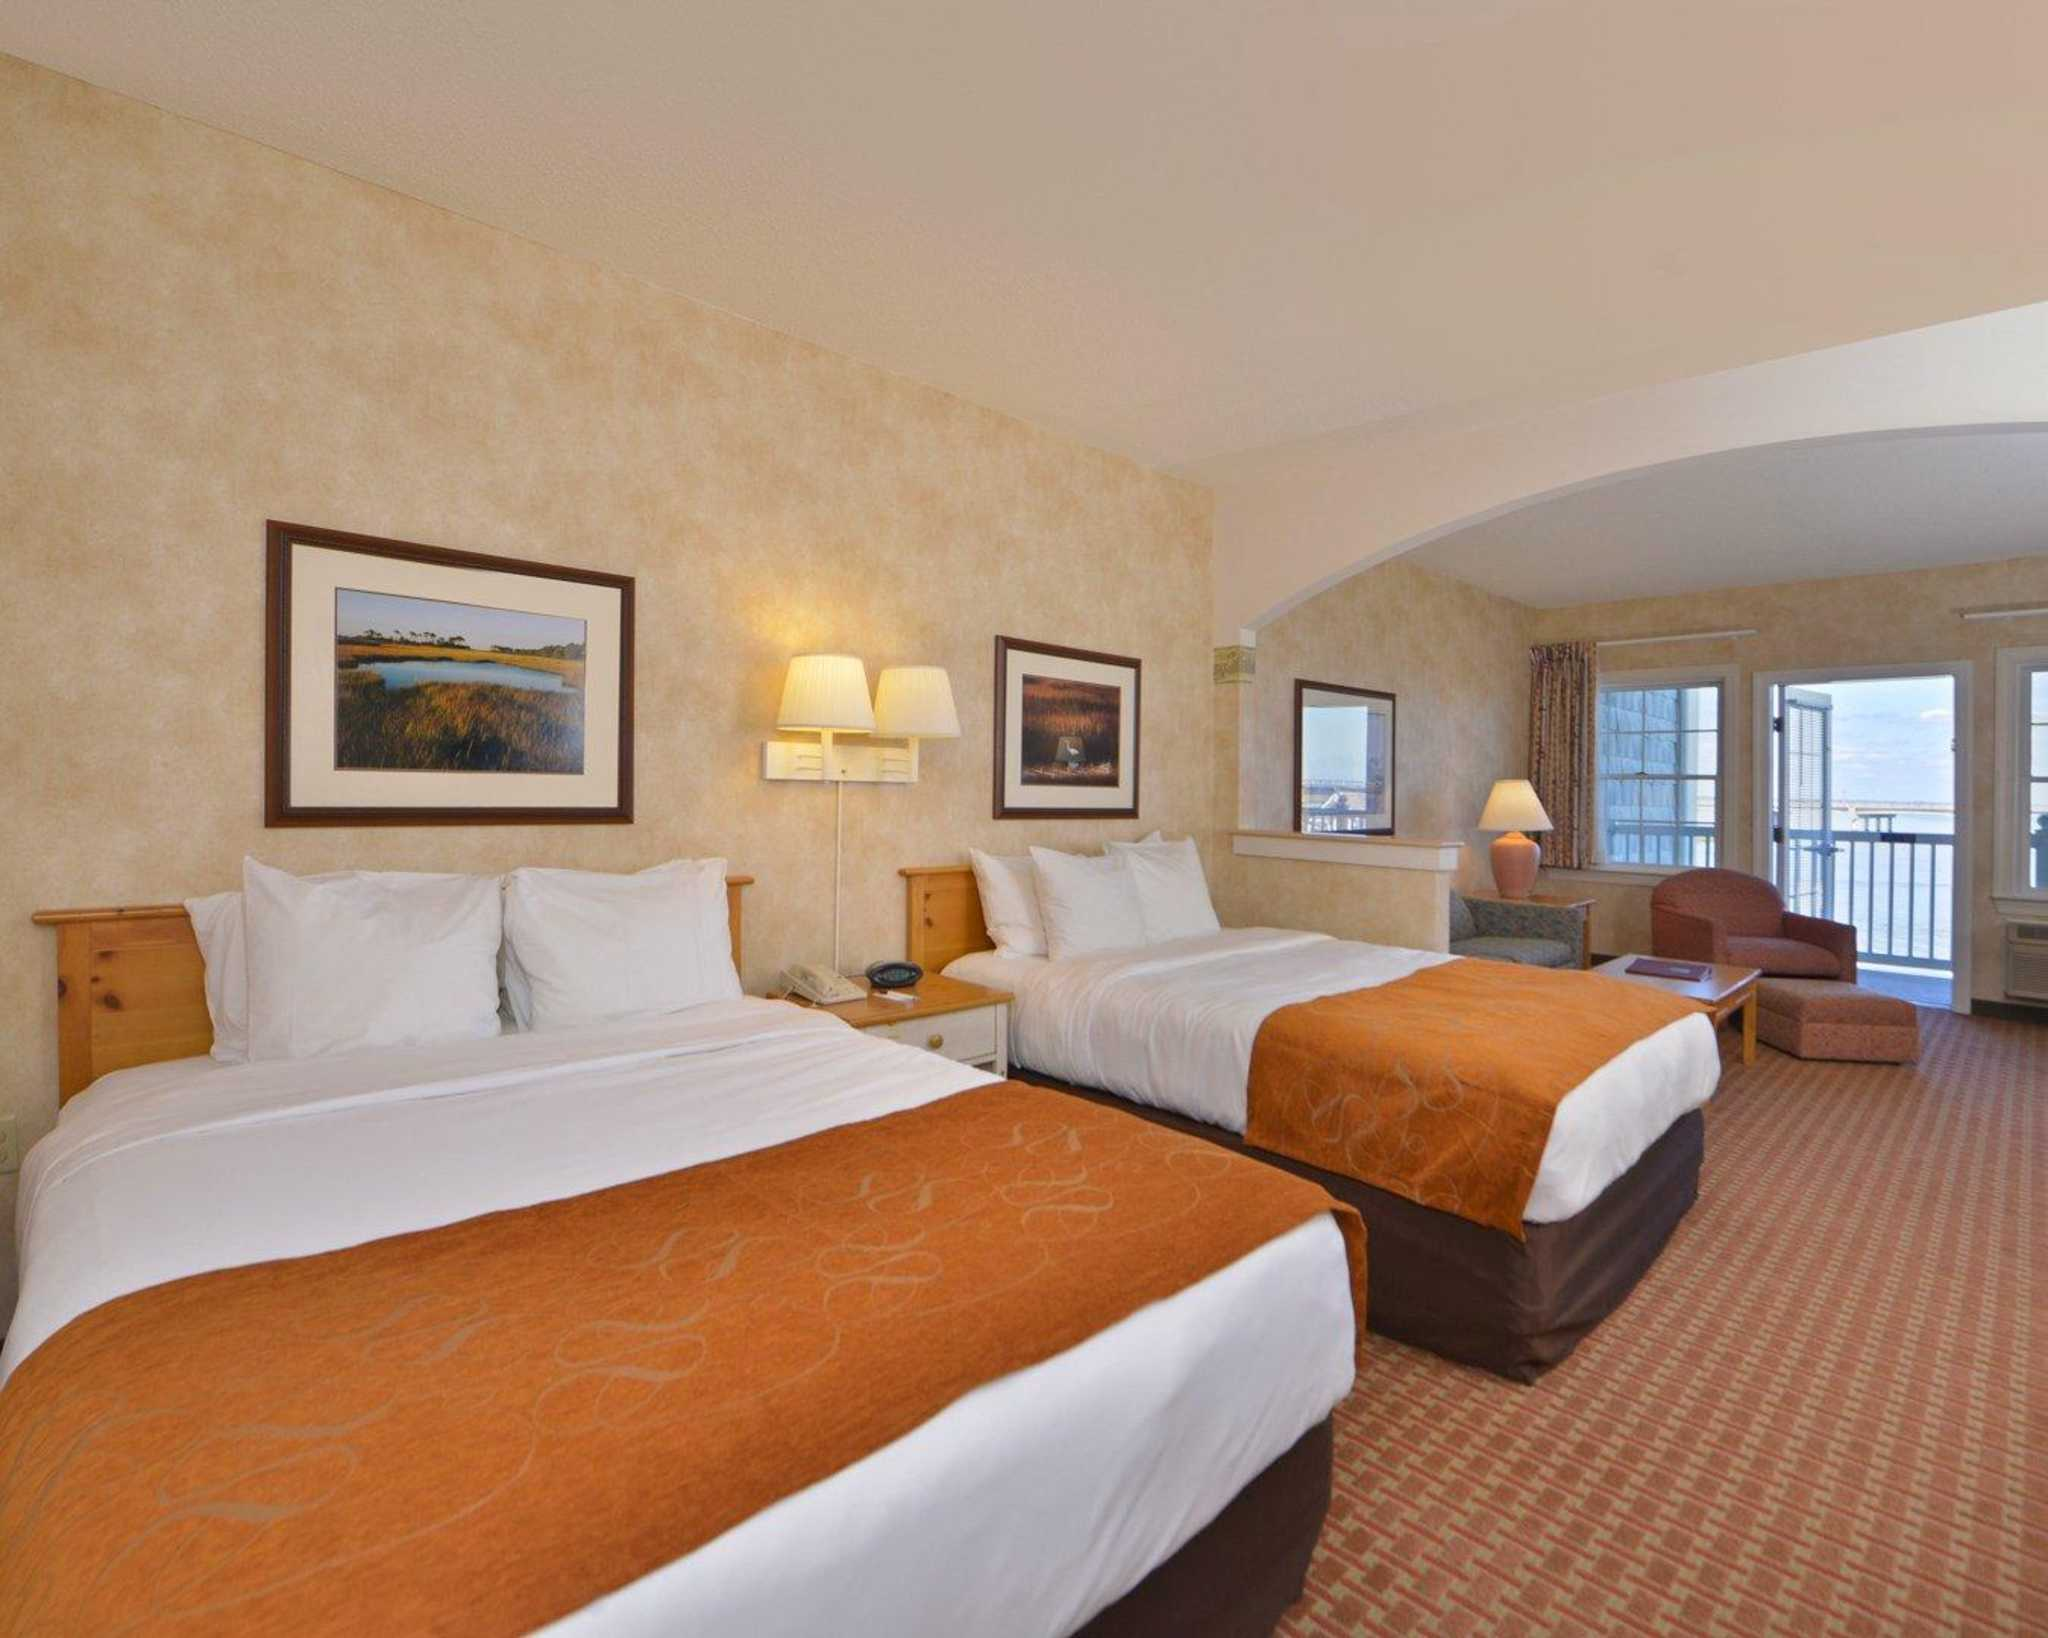 Comfort Suites image 13